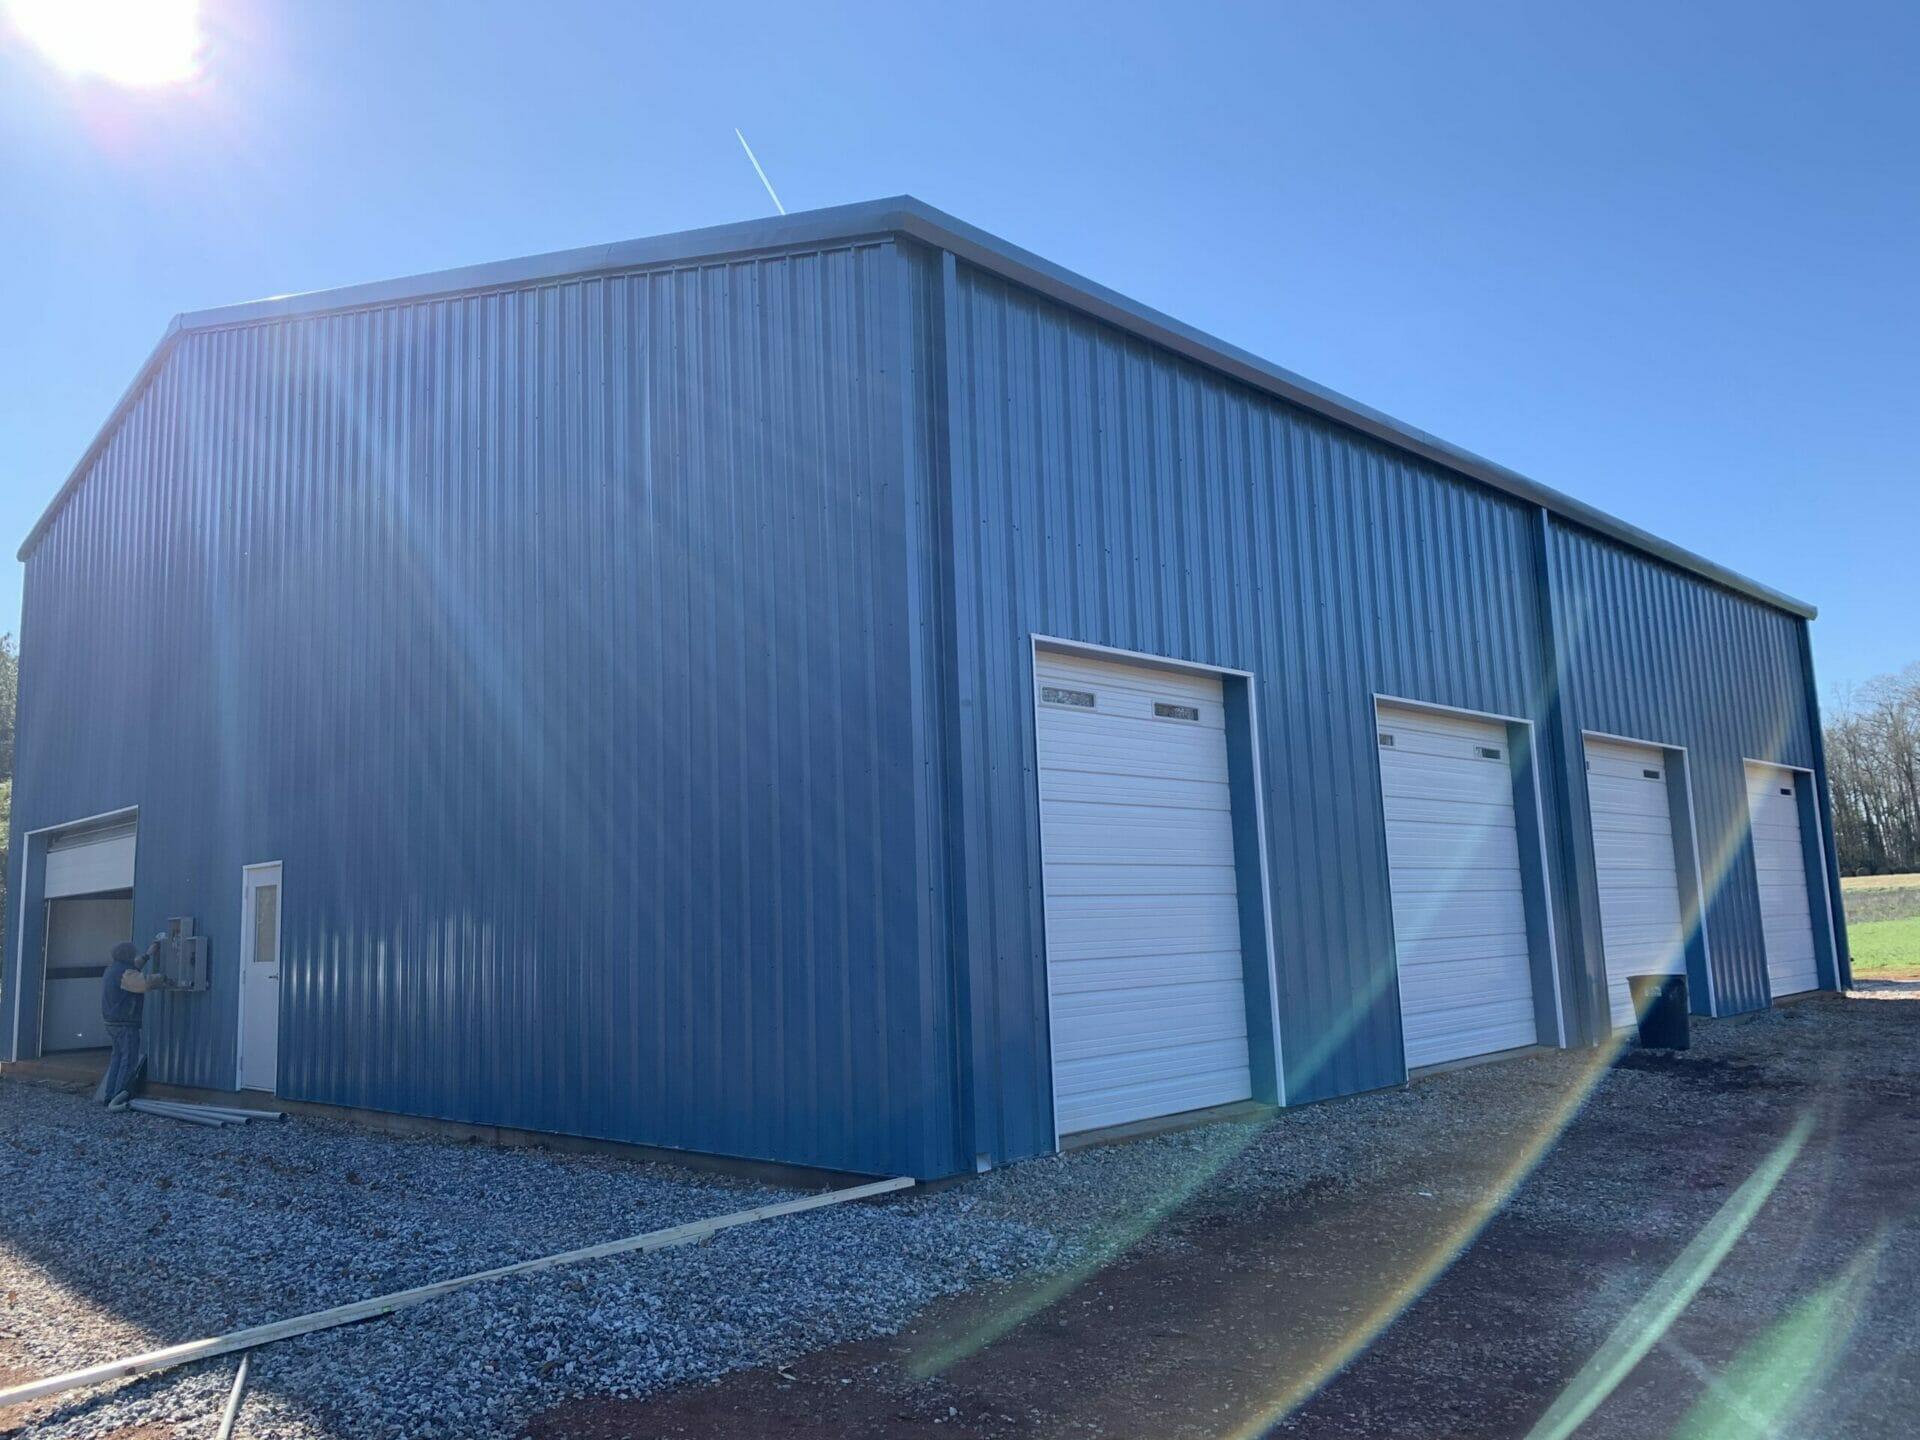 Custom Pre-Engineered Metal Garage Building 5 Bays With Roll Up Garage Doors And Side Entry Door